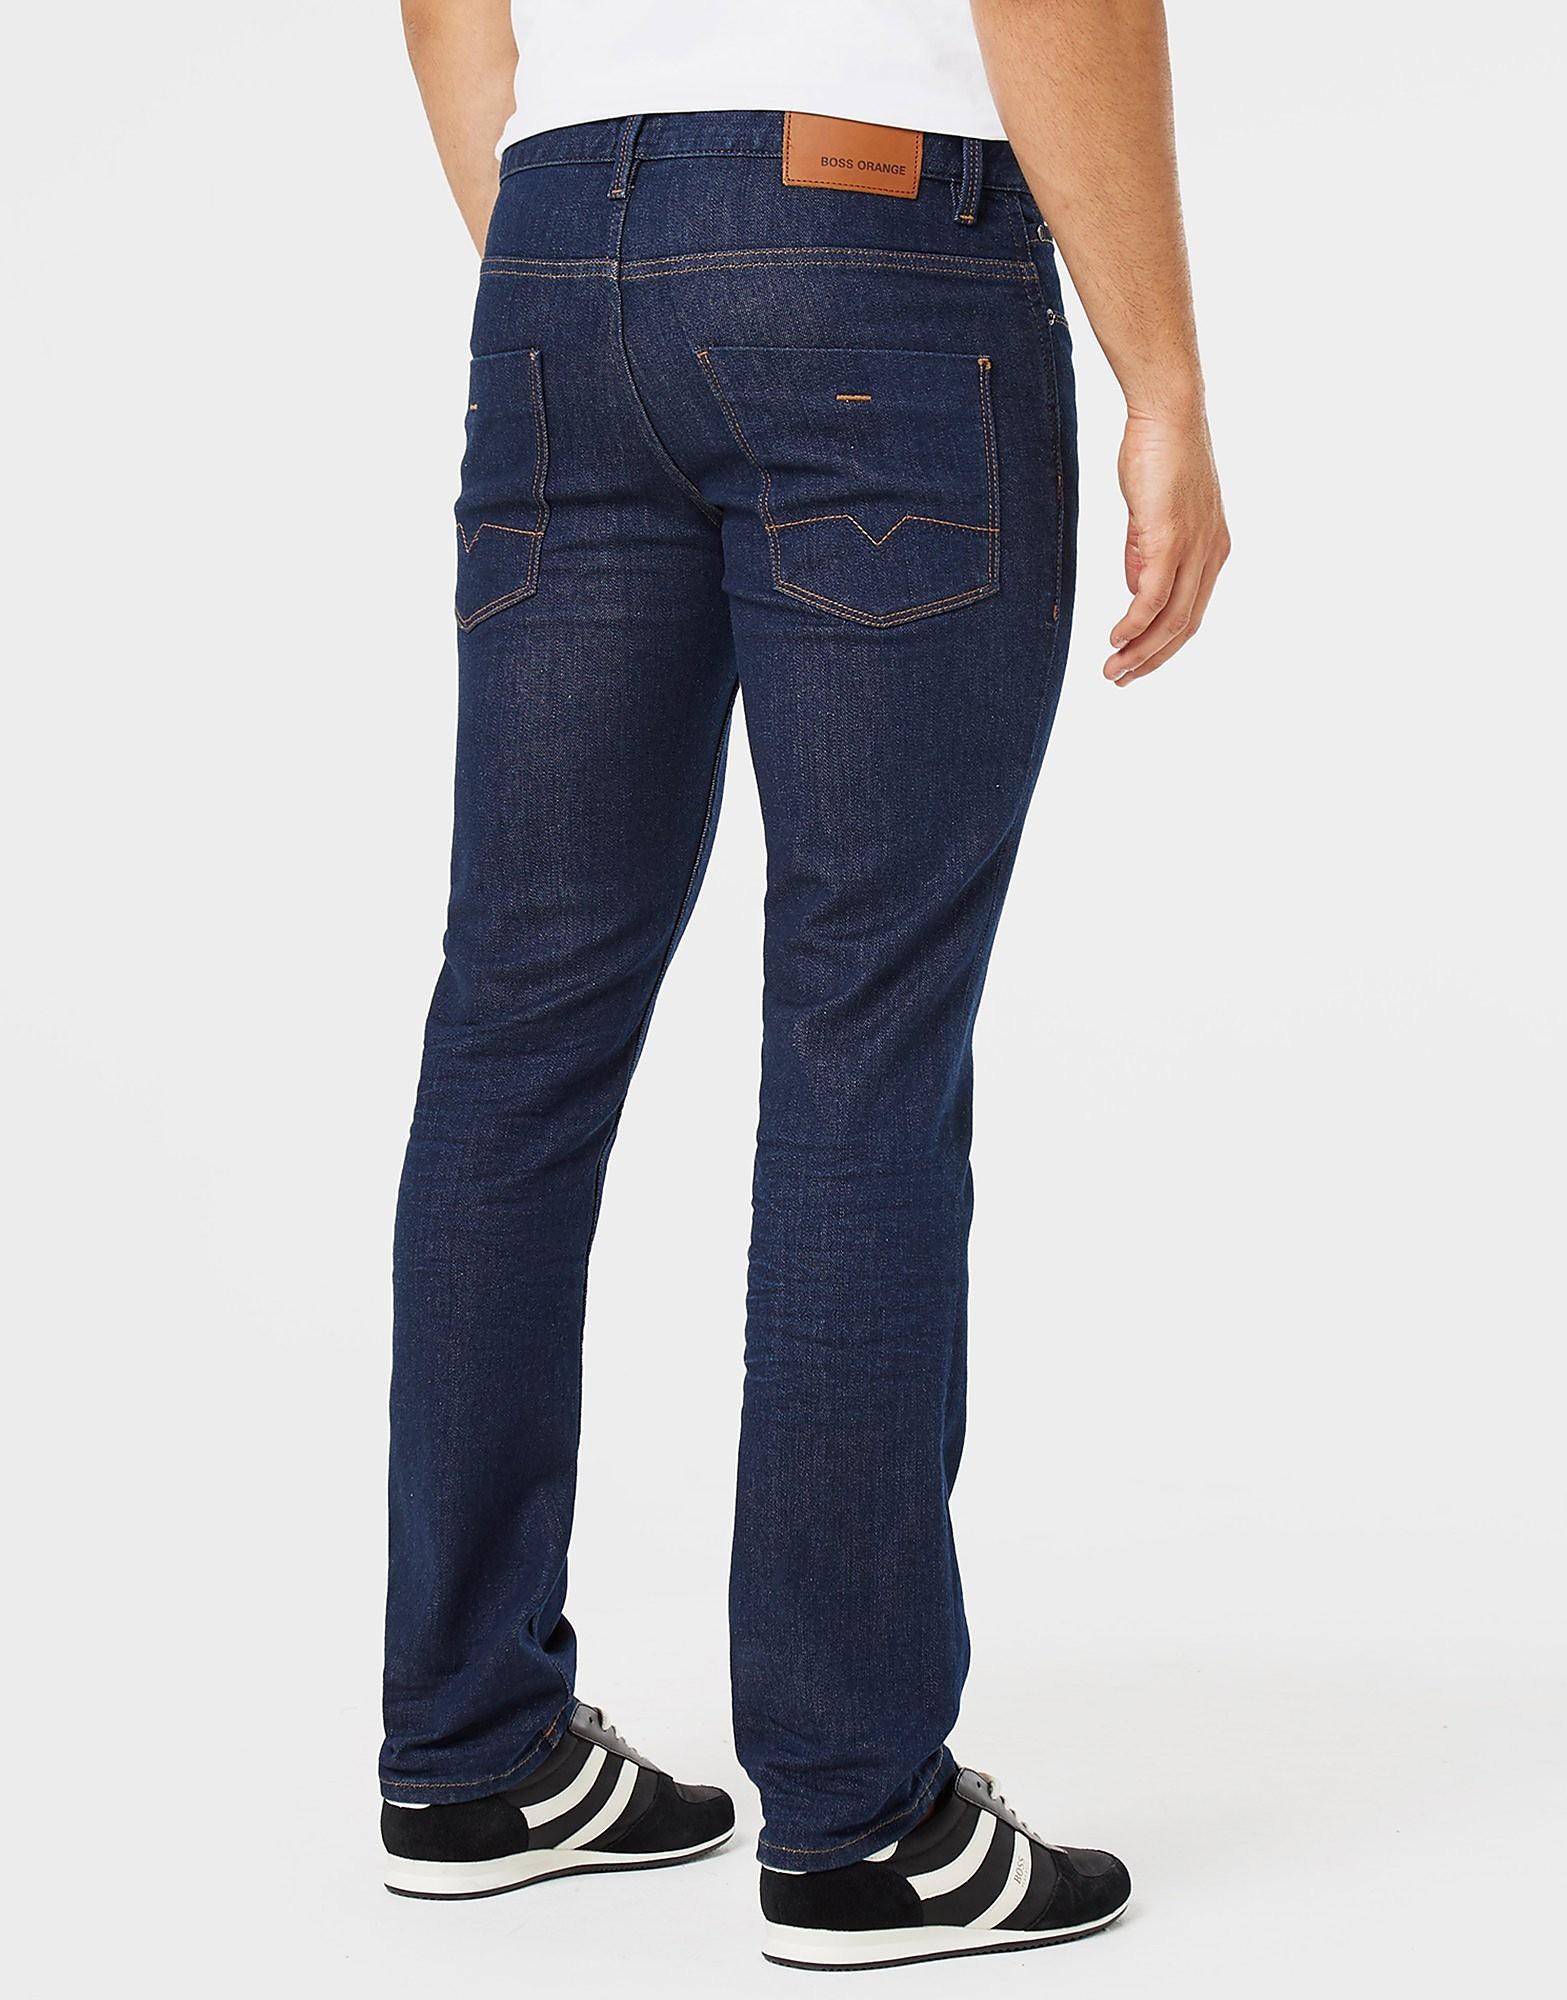 BOSS Orange 63 Slim Jean